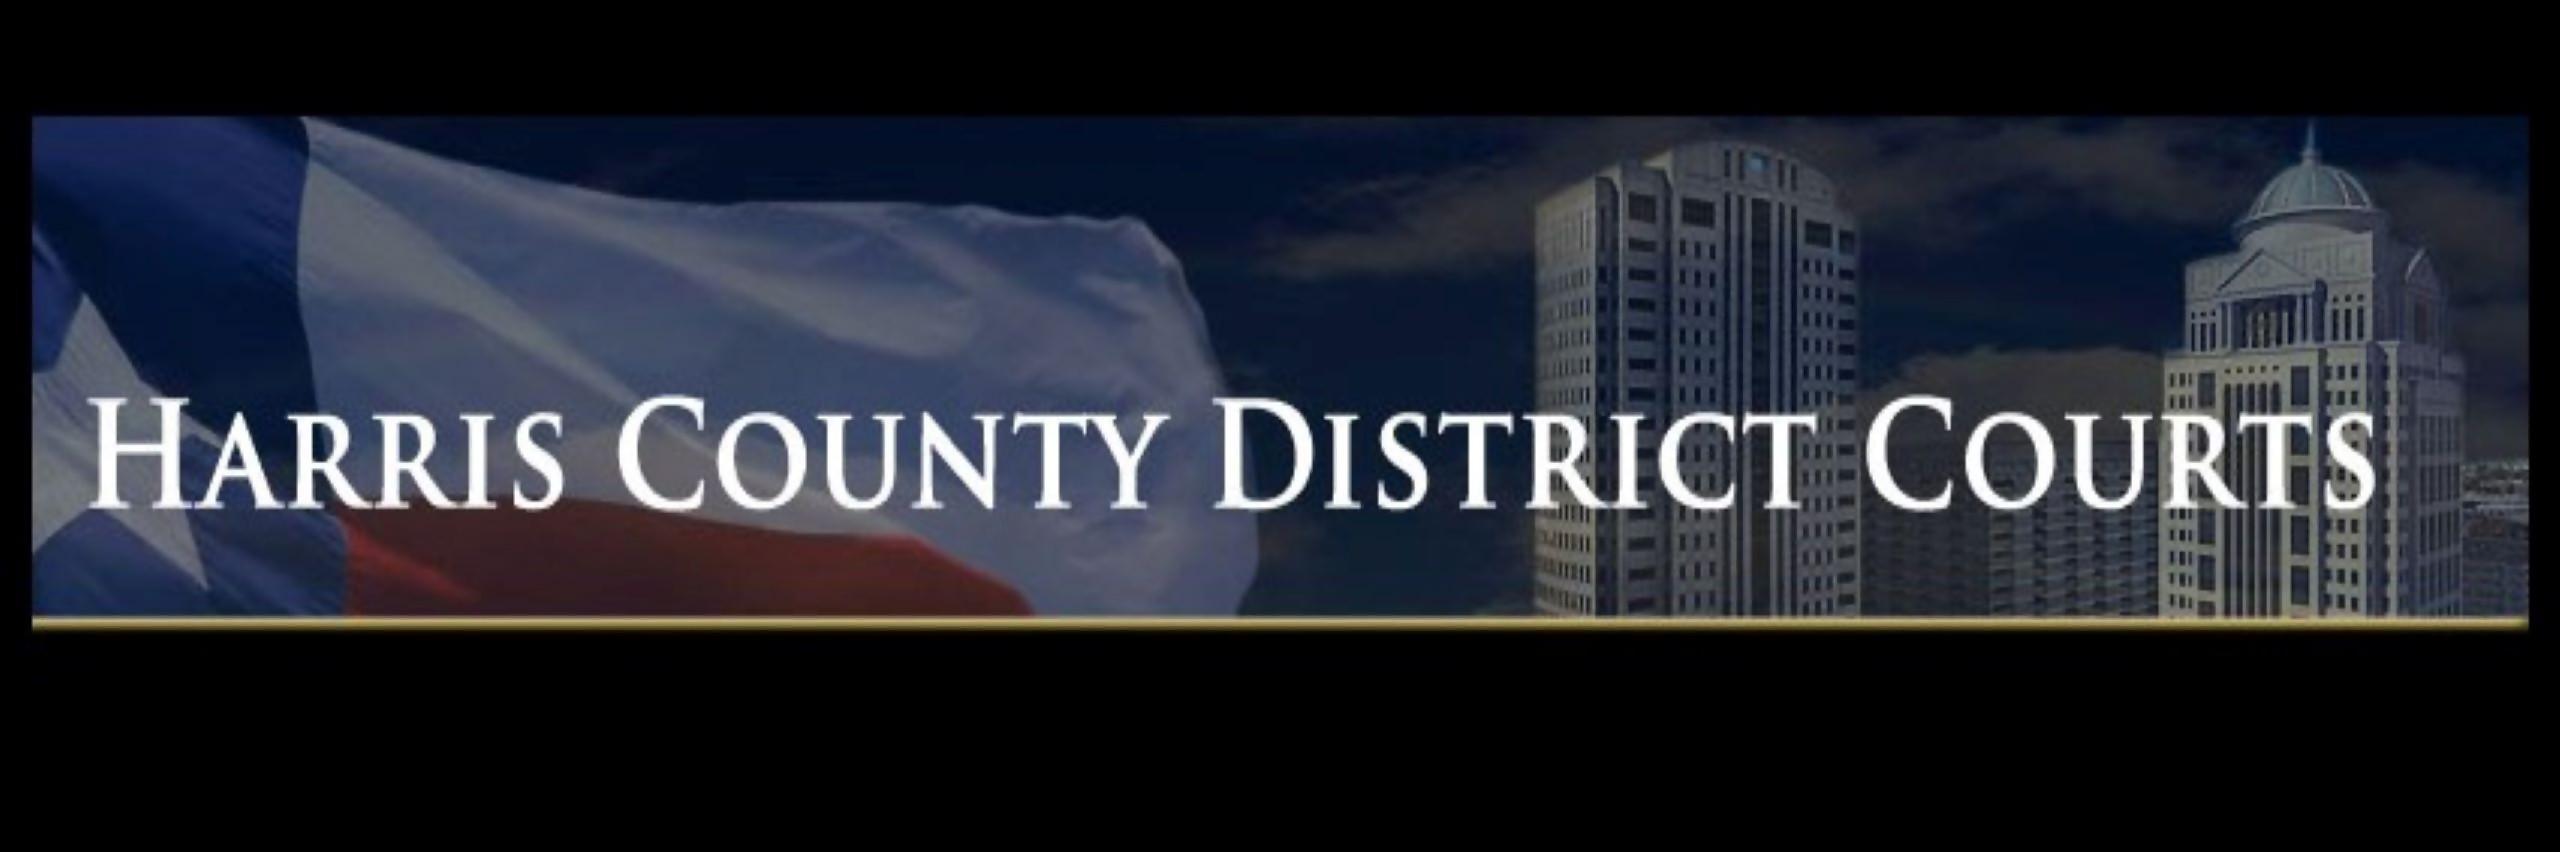 125th District Court - Live Stream